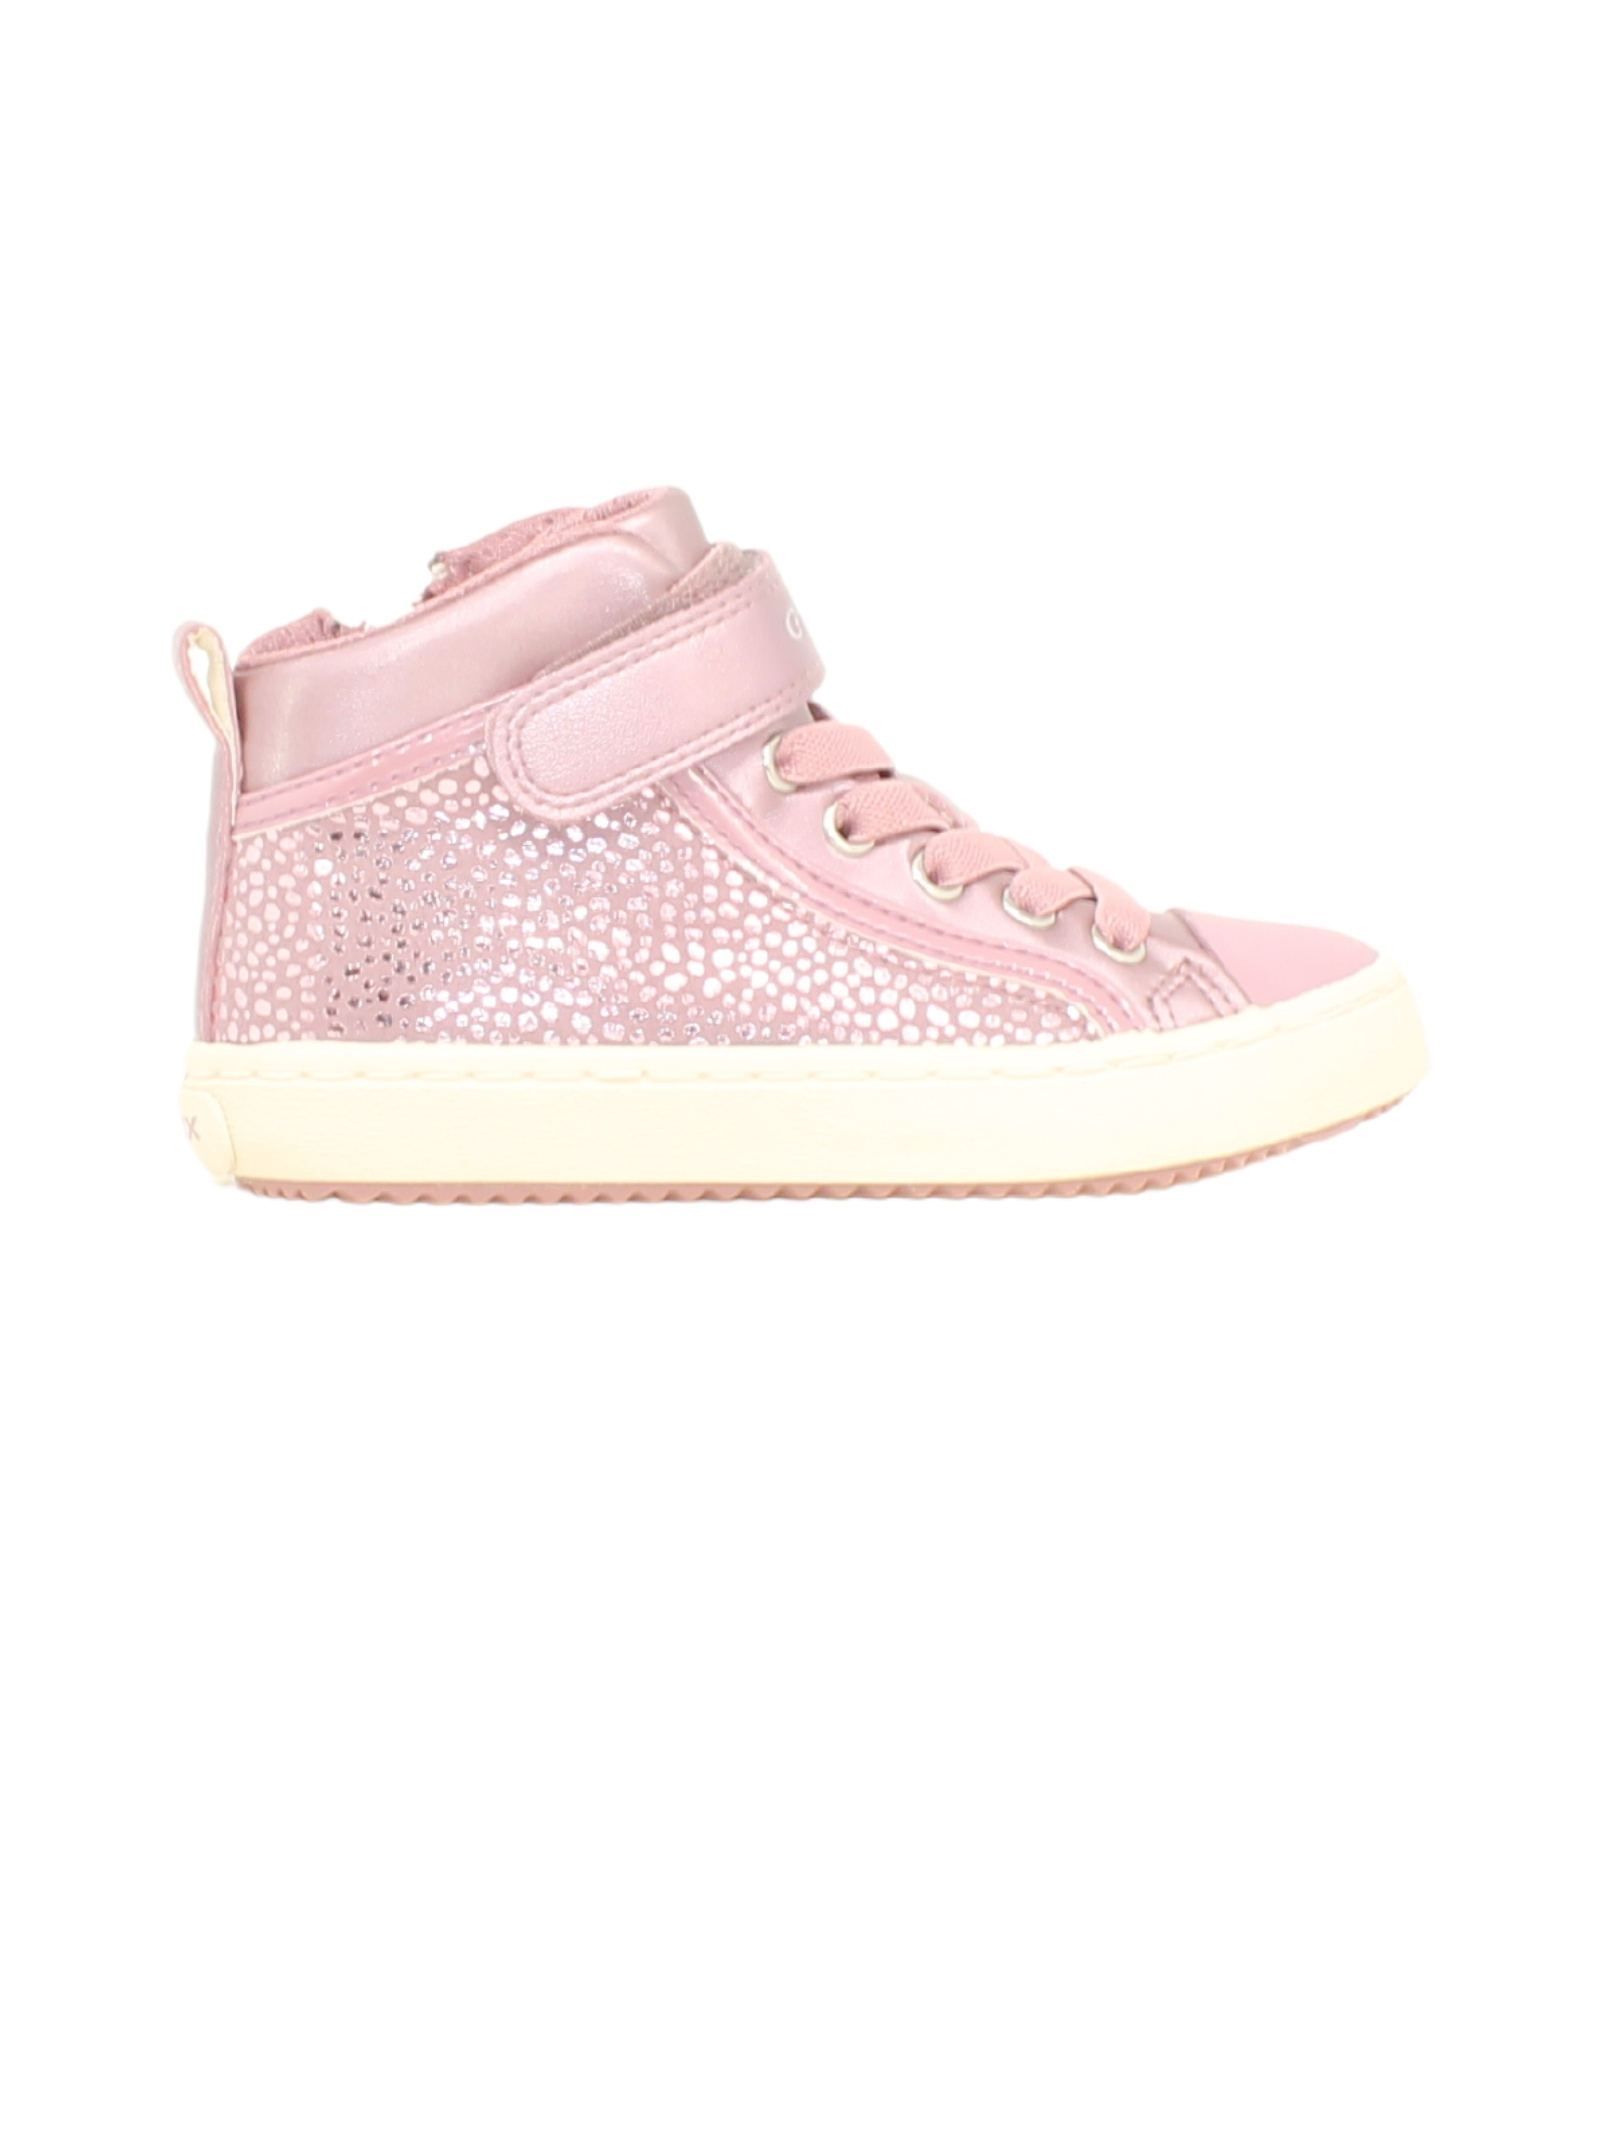 Sneakers Dk Rose Bambina GEOX KIDS   Sneakers   J744GI0DHAJC8007